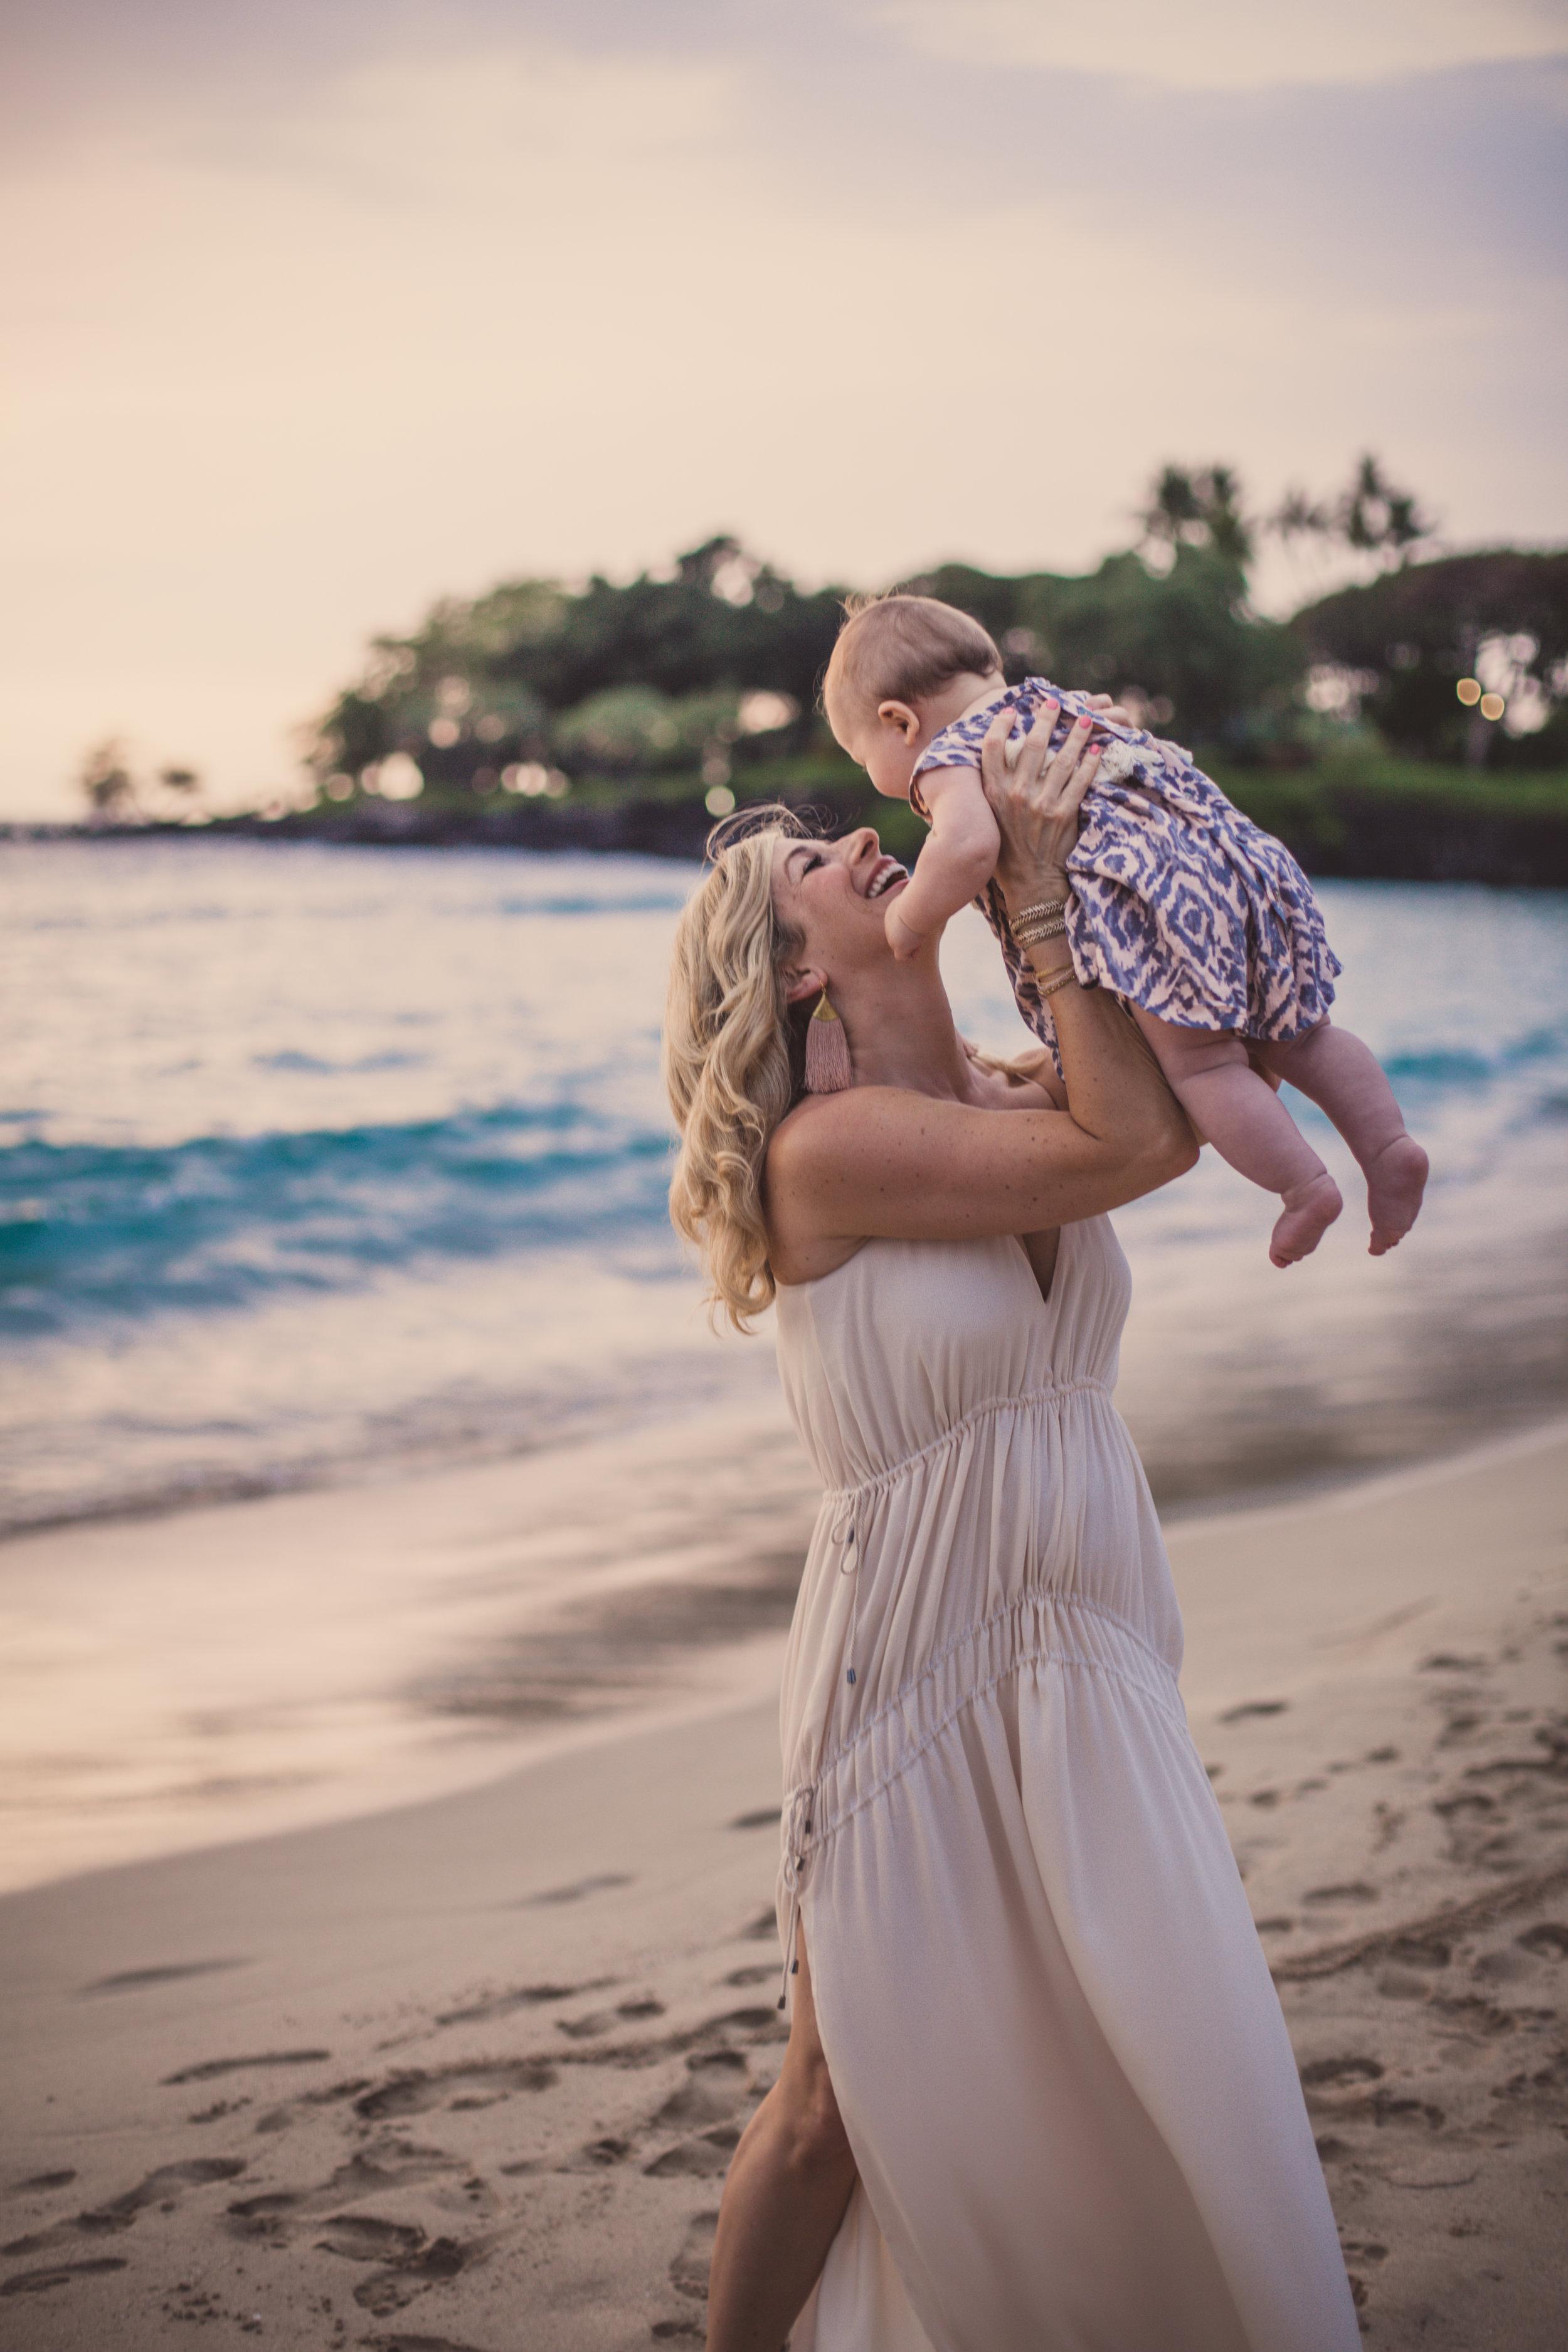 big island hawaii mauna kea beach family © kelilina photography 20170413183406.jpg